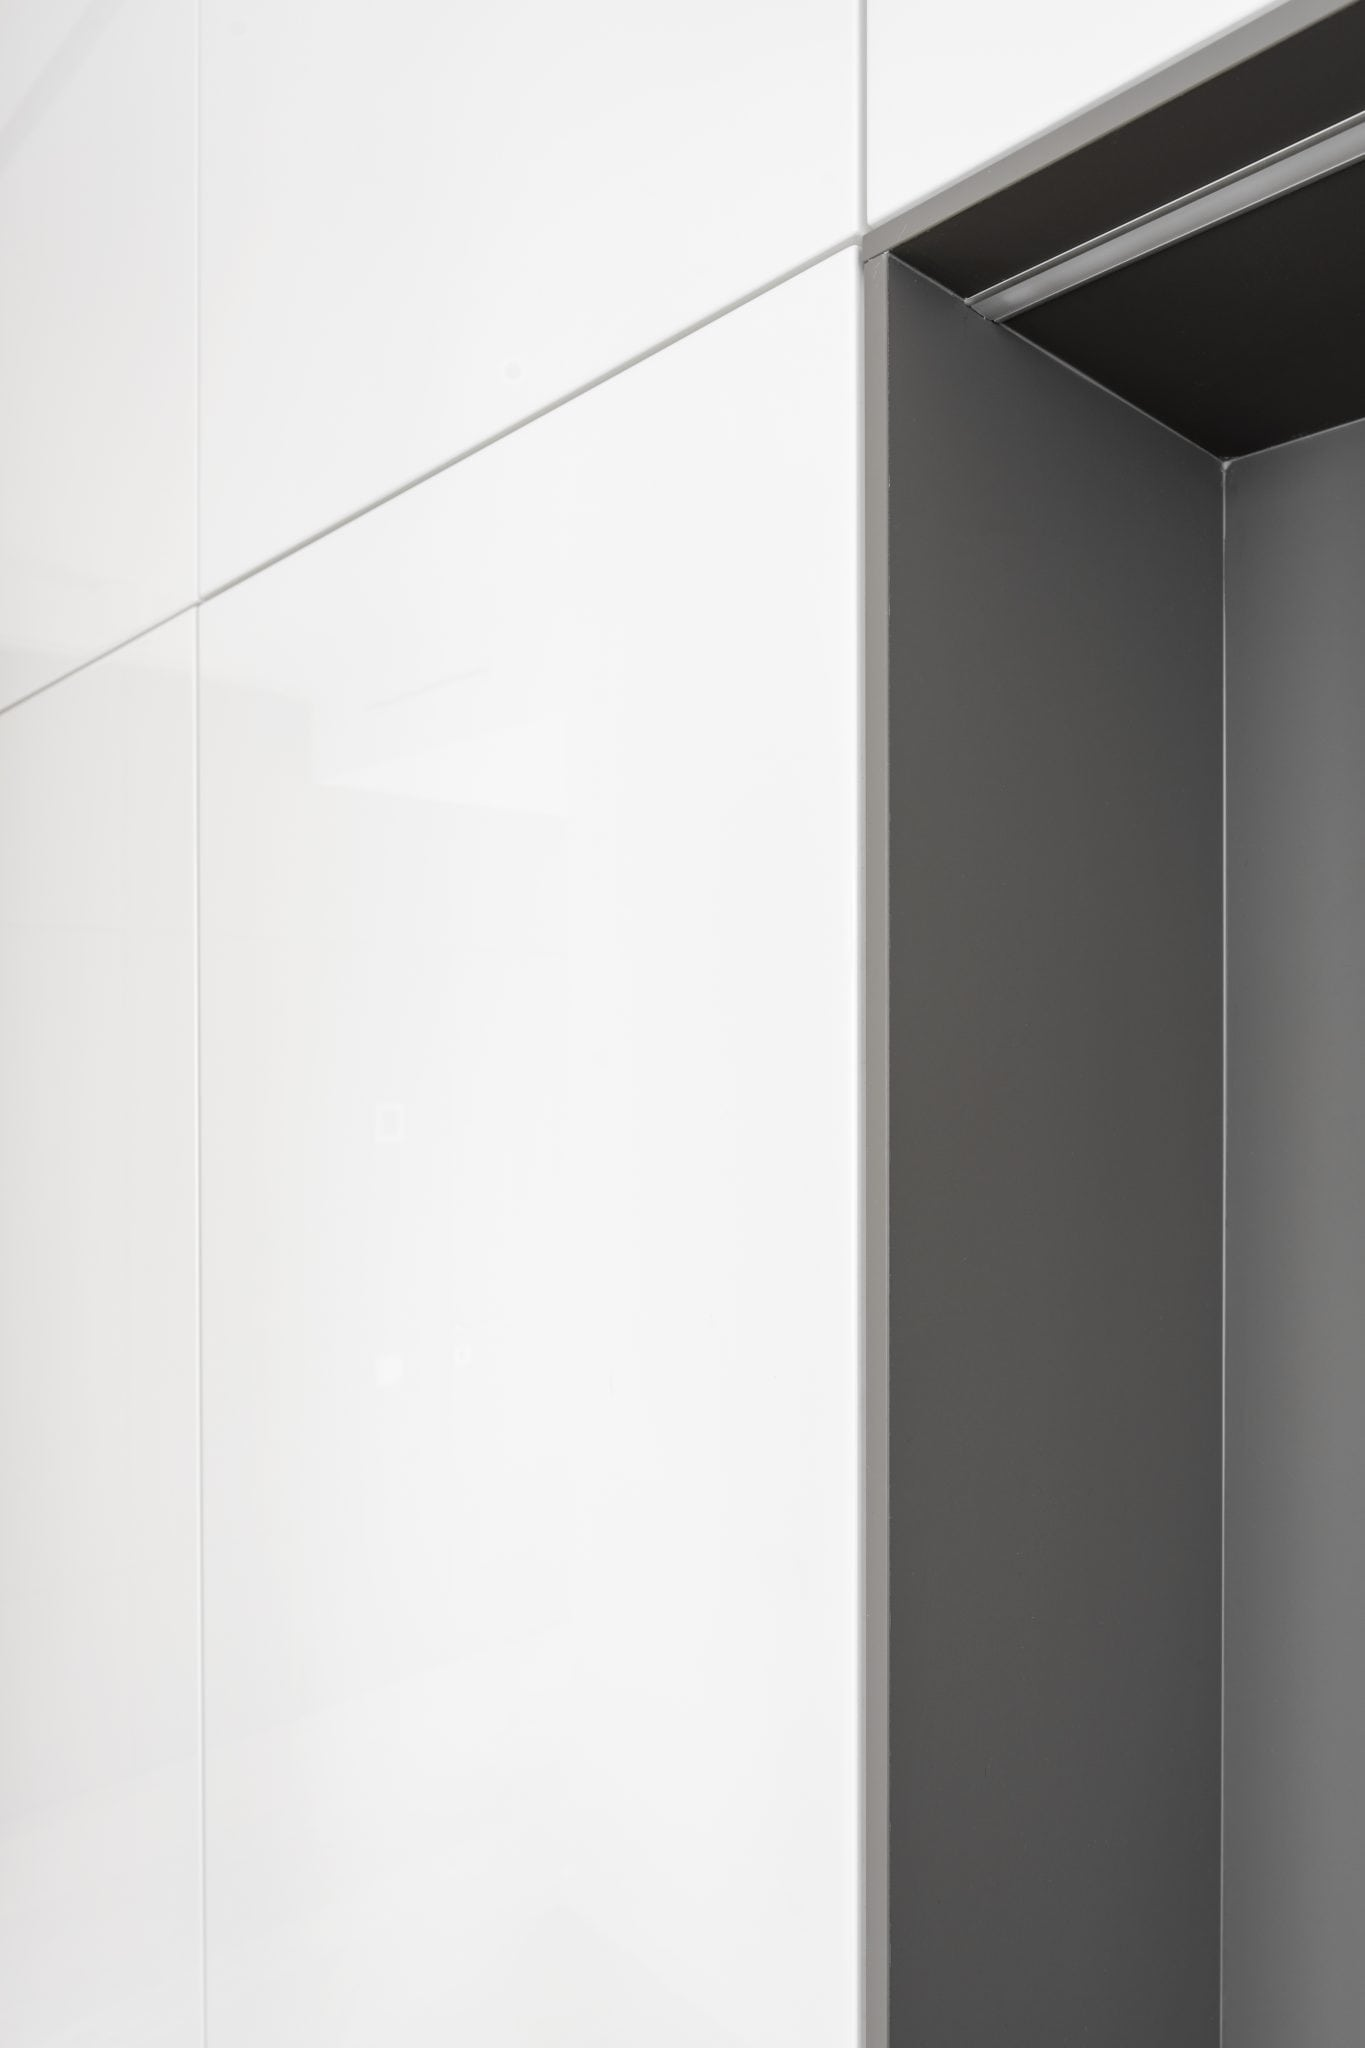 Moderni balta virtuve pagal individualu uzsakyma